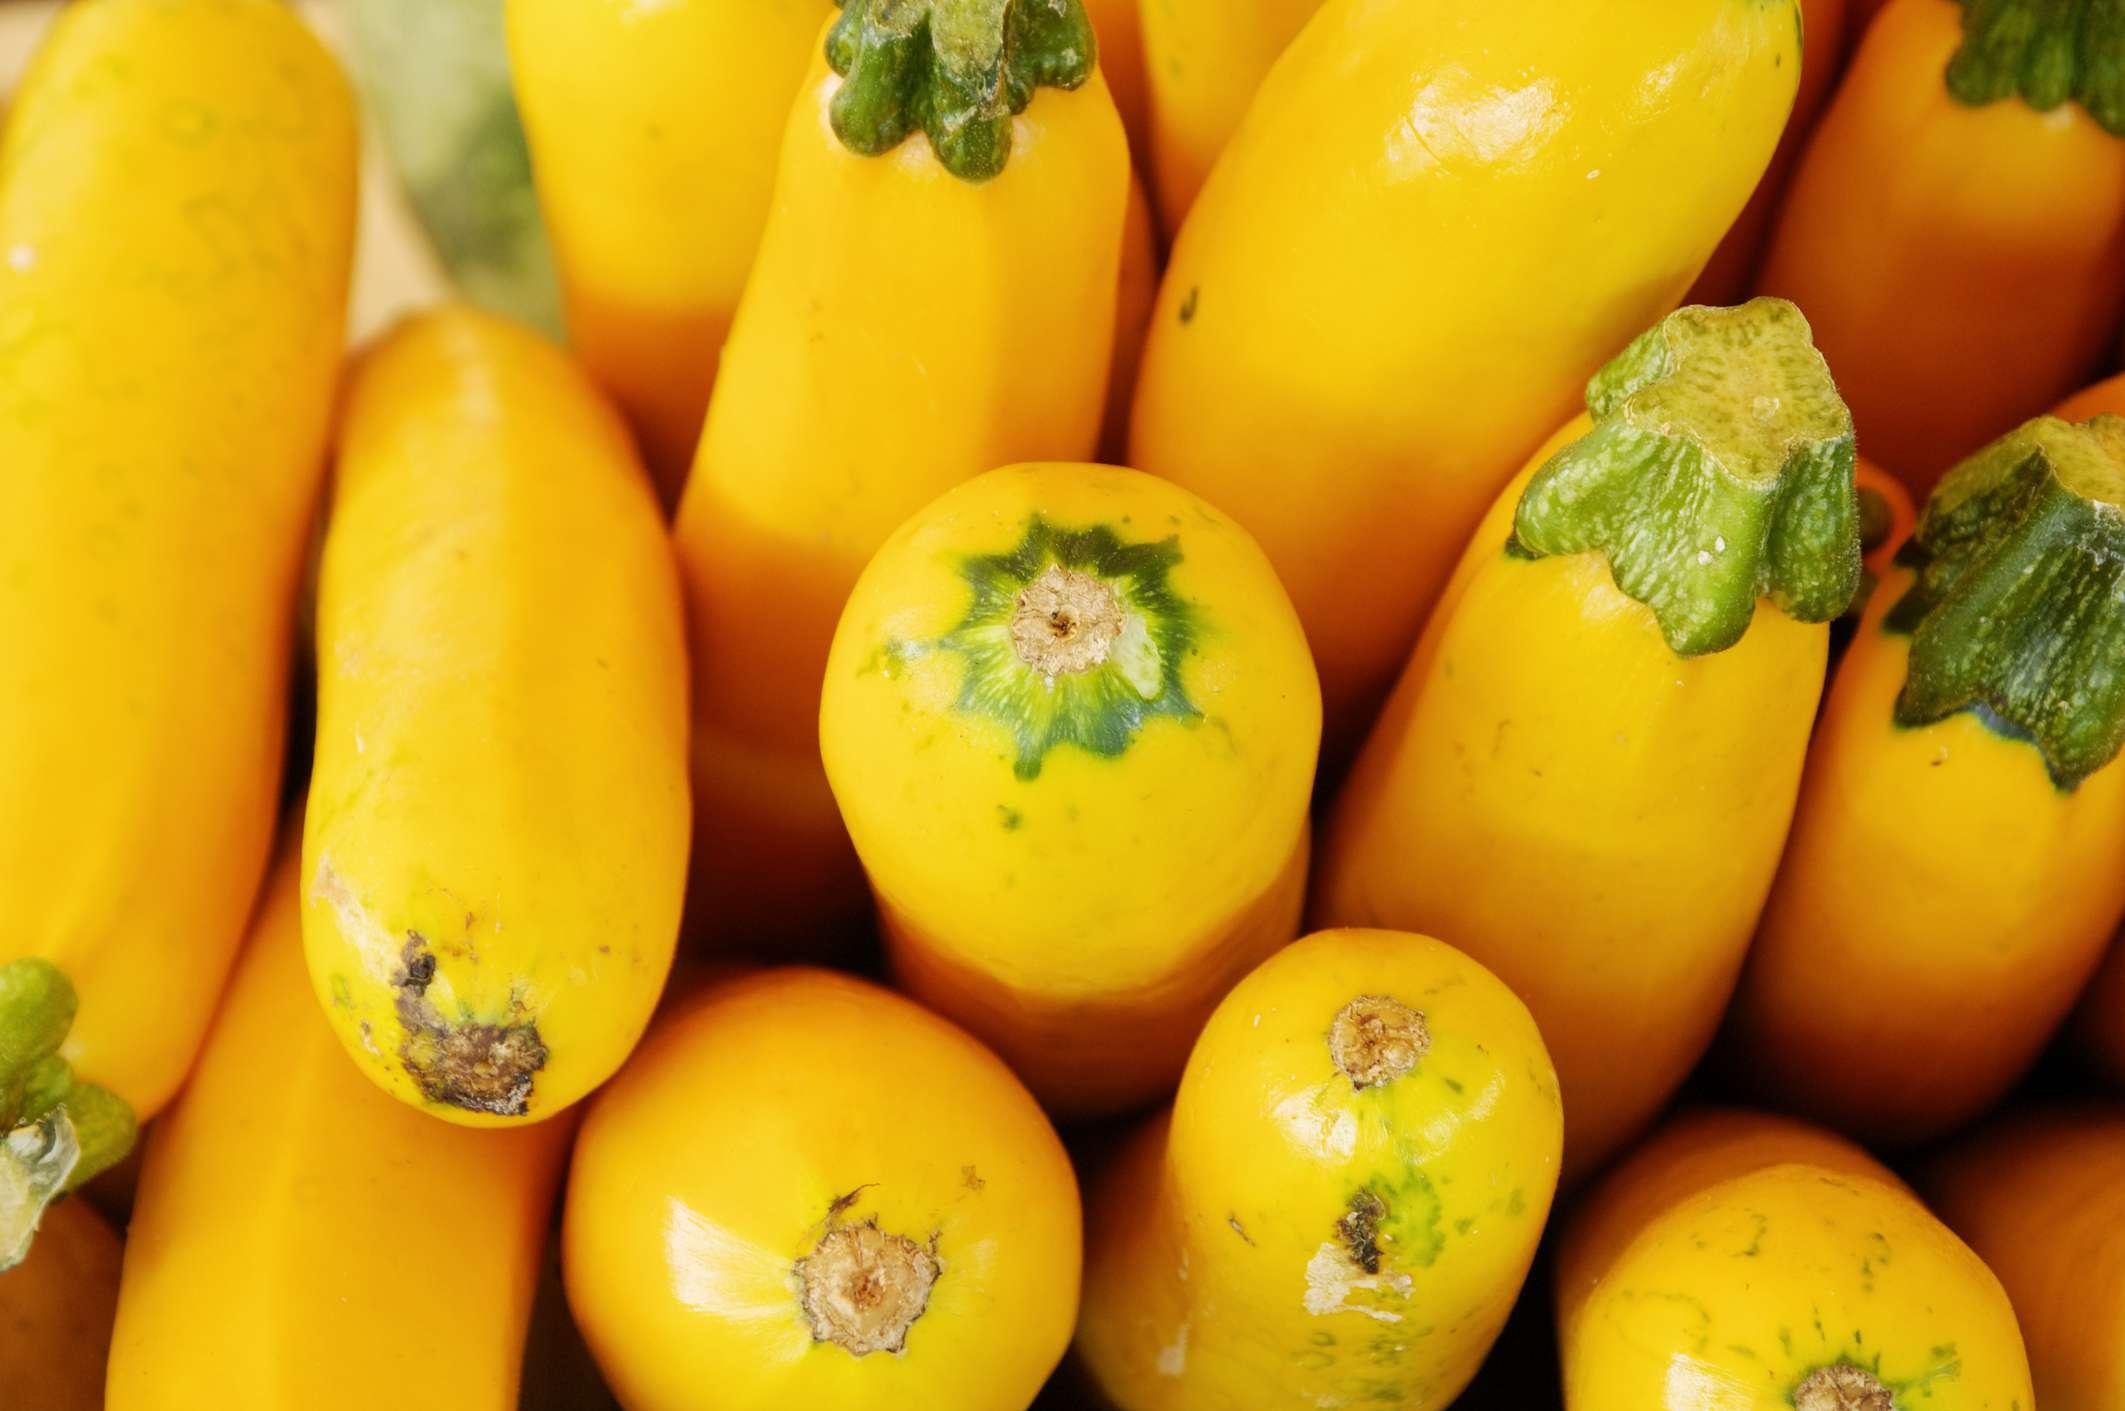 Yellow squash at farmer's market